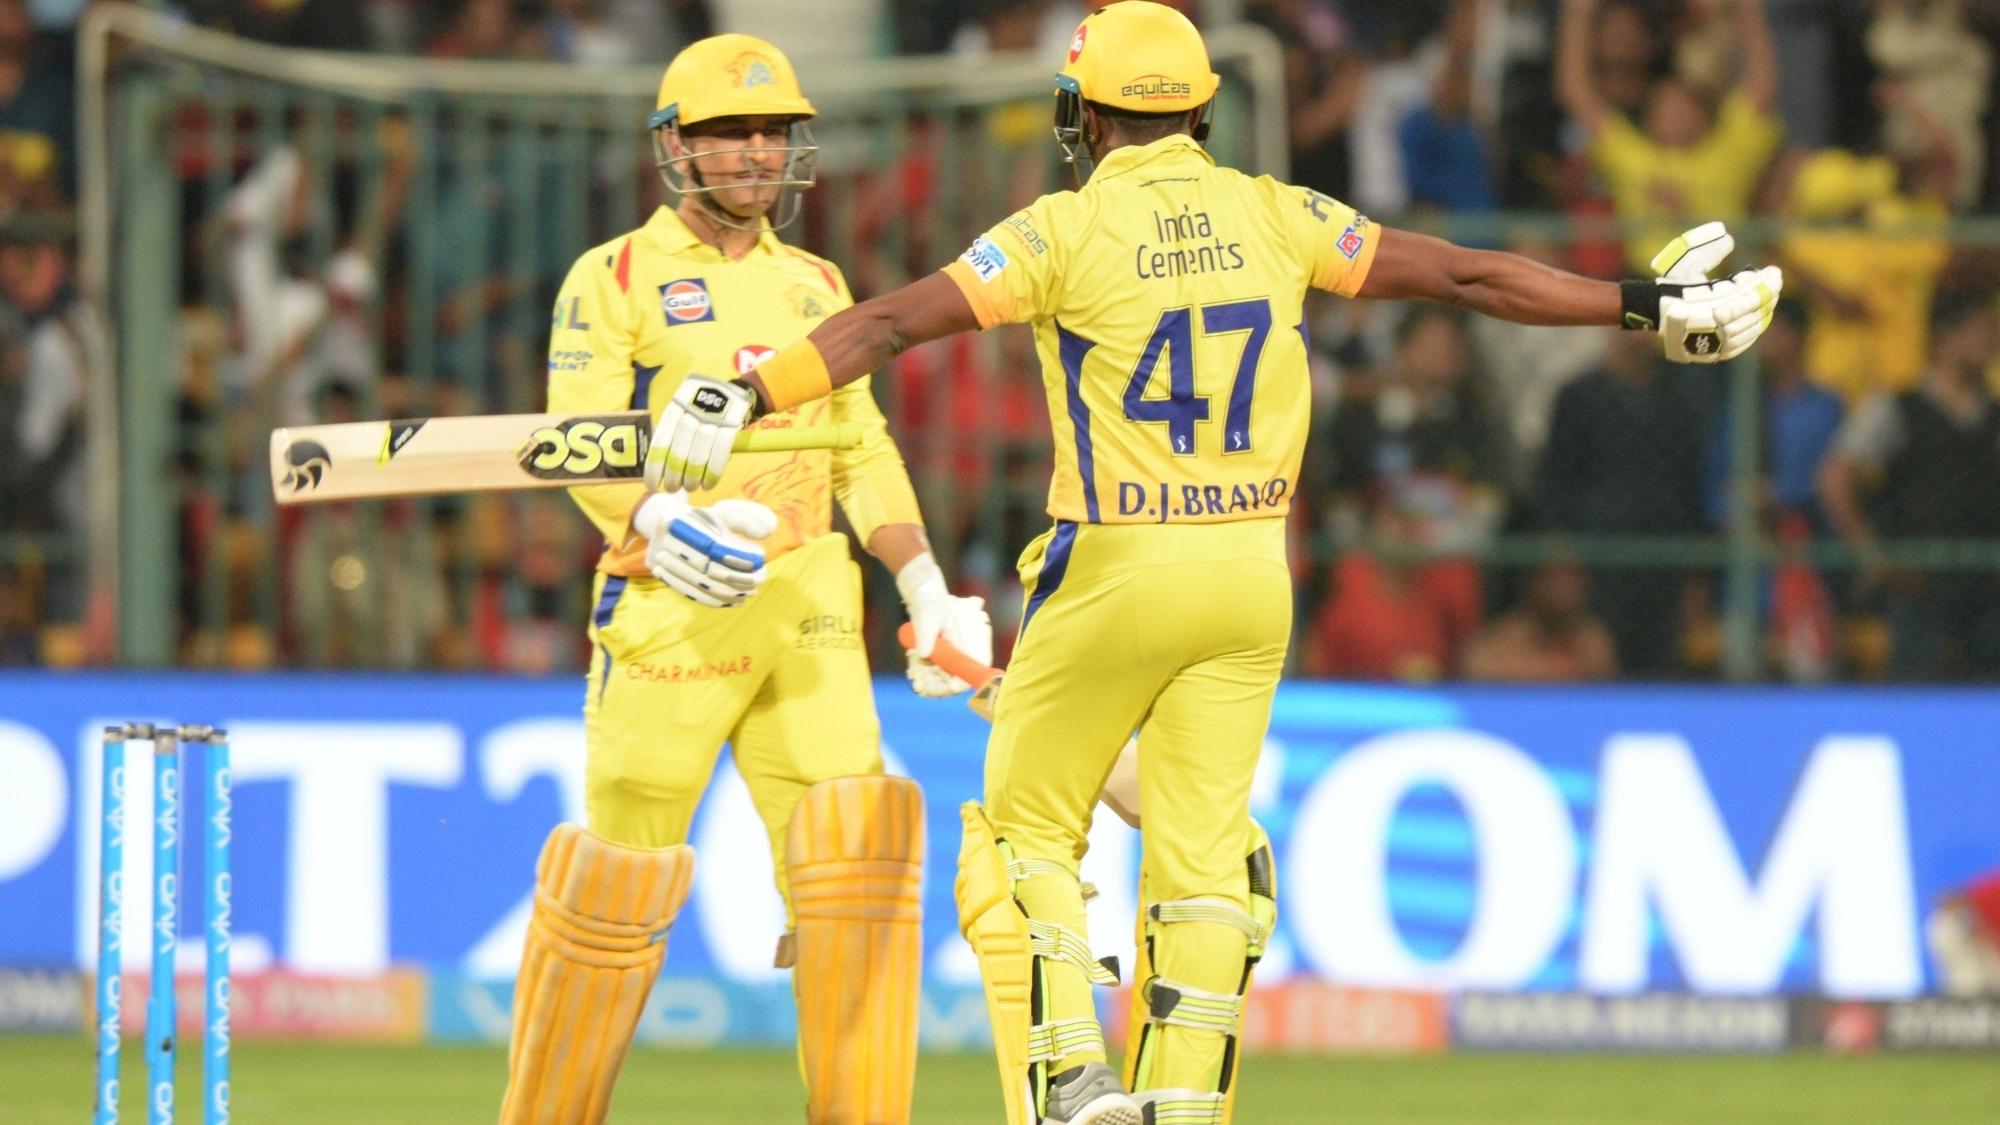 IPL 2018: सीएसके के पूर्व सलामी बल्लेबाज ने महेंद्र सिंह धोनी को बताया 'रियल यूनिवर्स बॉस'